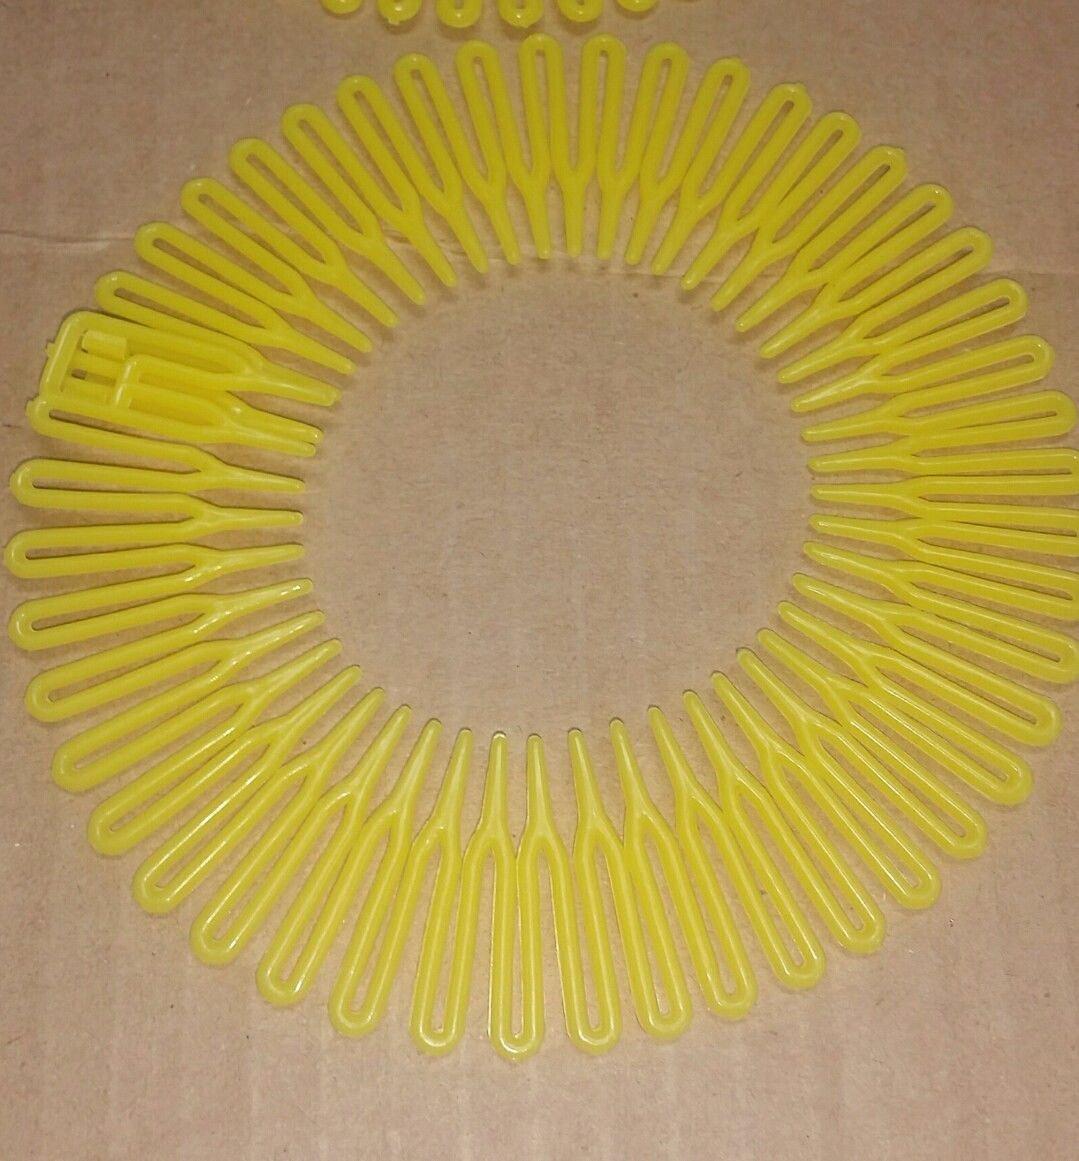 3 PIECE SET headband Set 3 Flex spider hair comb teeth accordion stretch